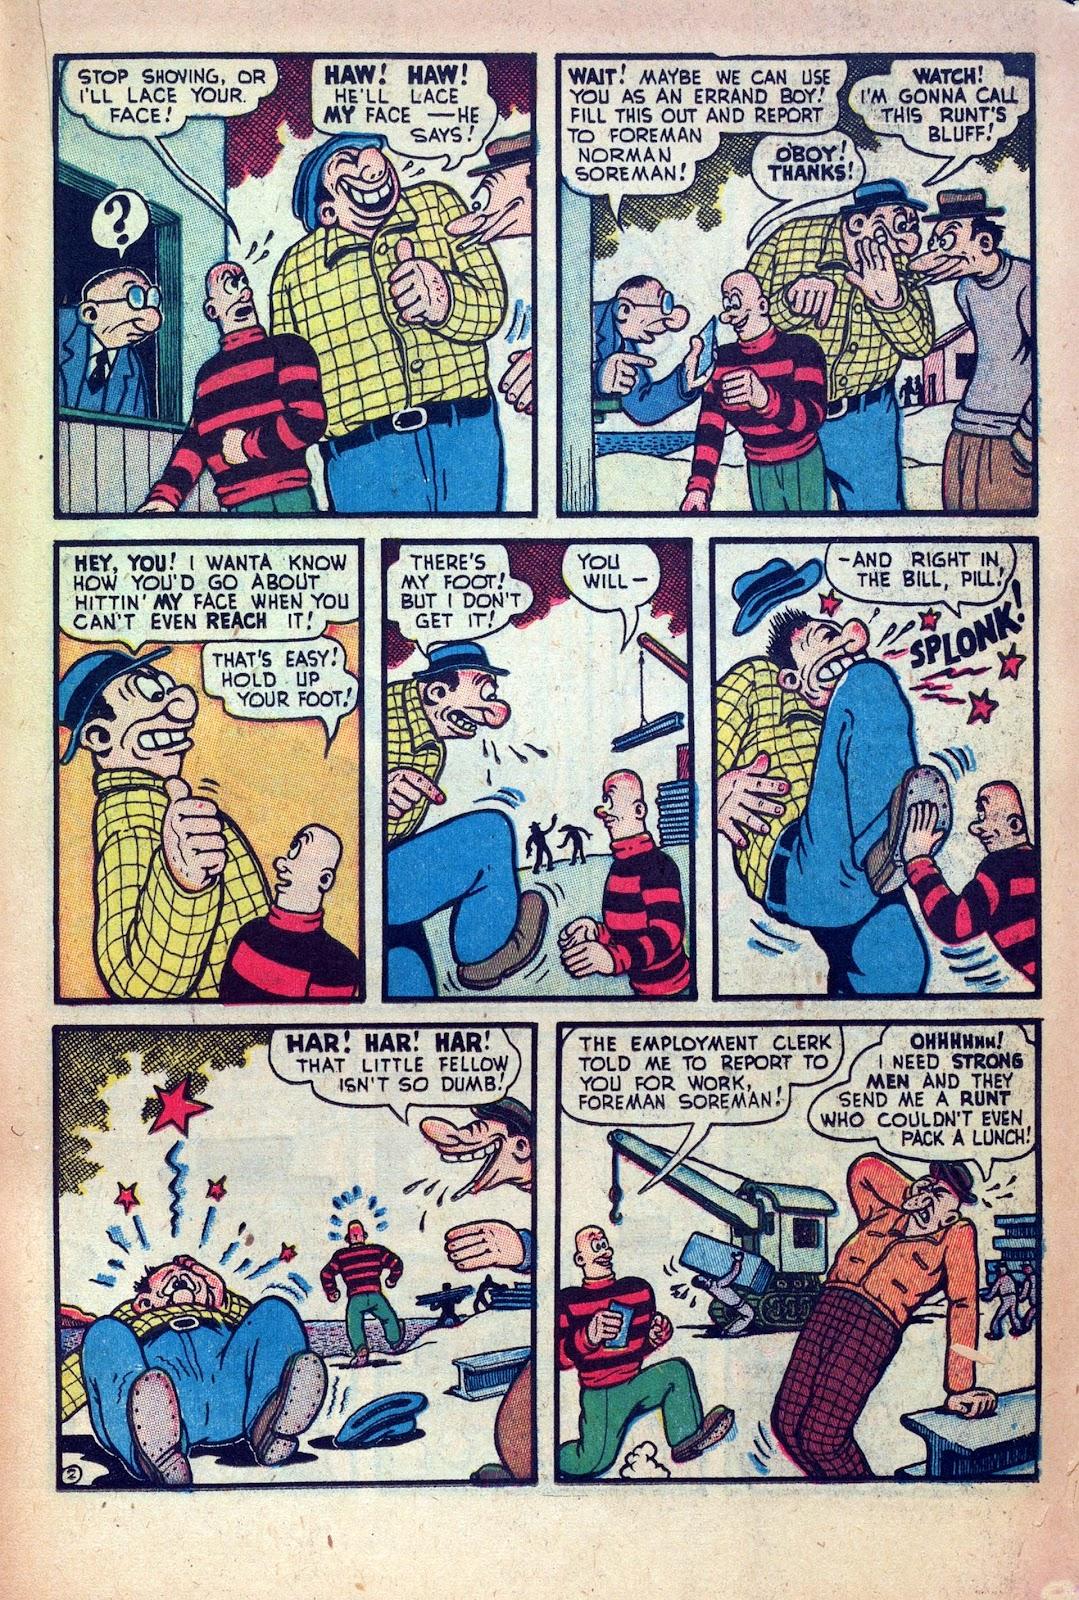 Read online Joker Comics comic -  Issue #29 - 19